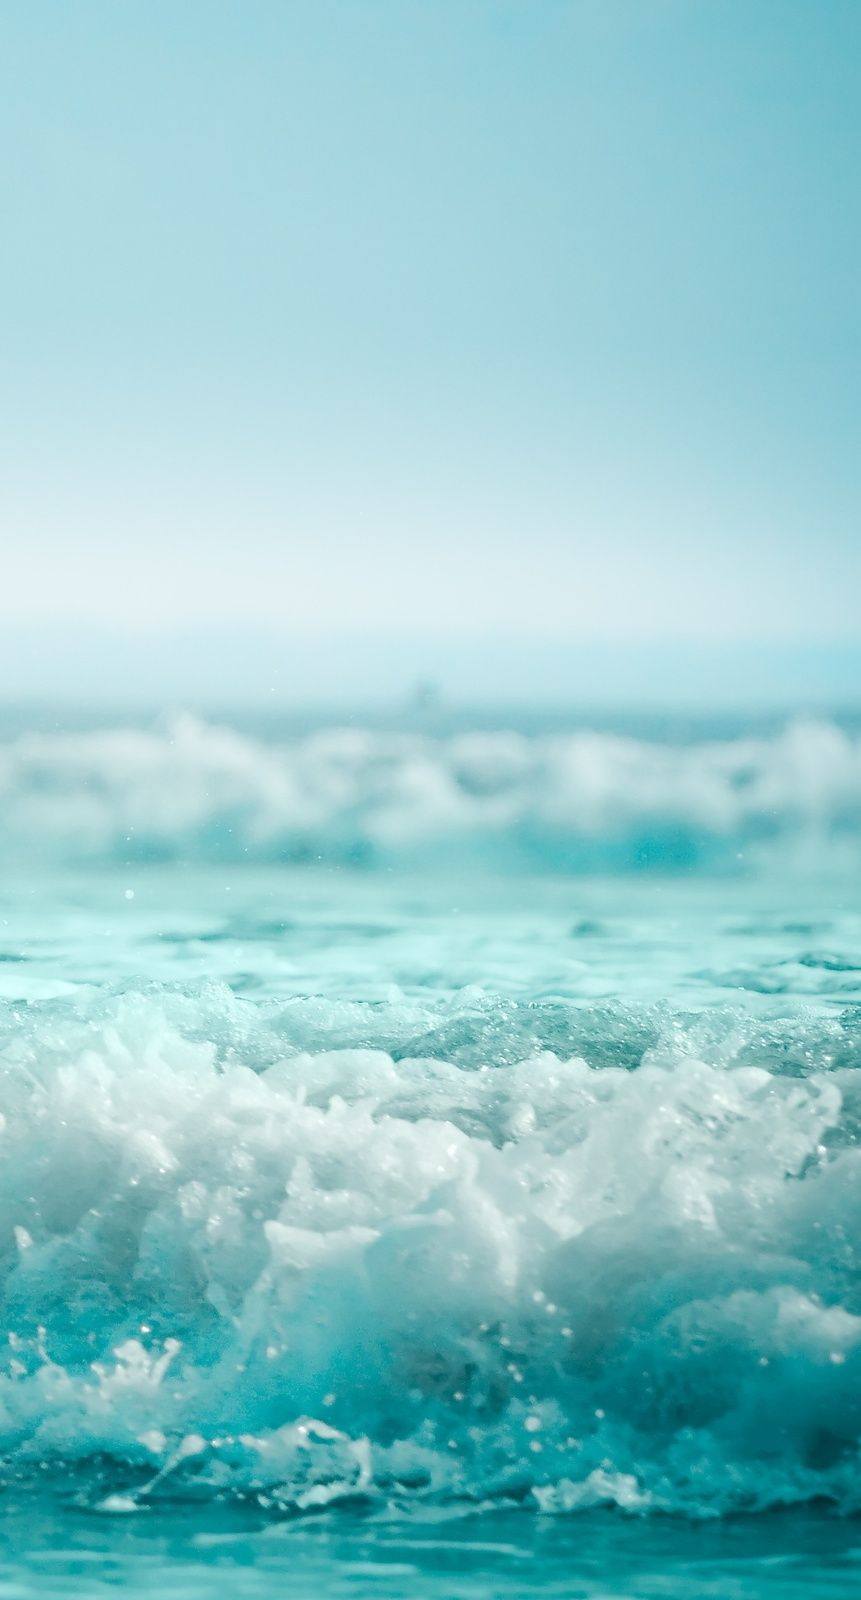 Blue Summer Ocean Wallpaper Sea Waves Ocean